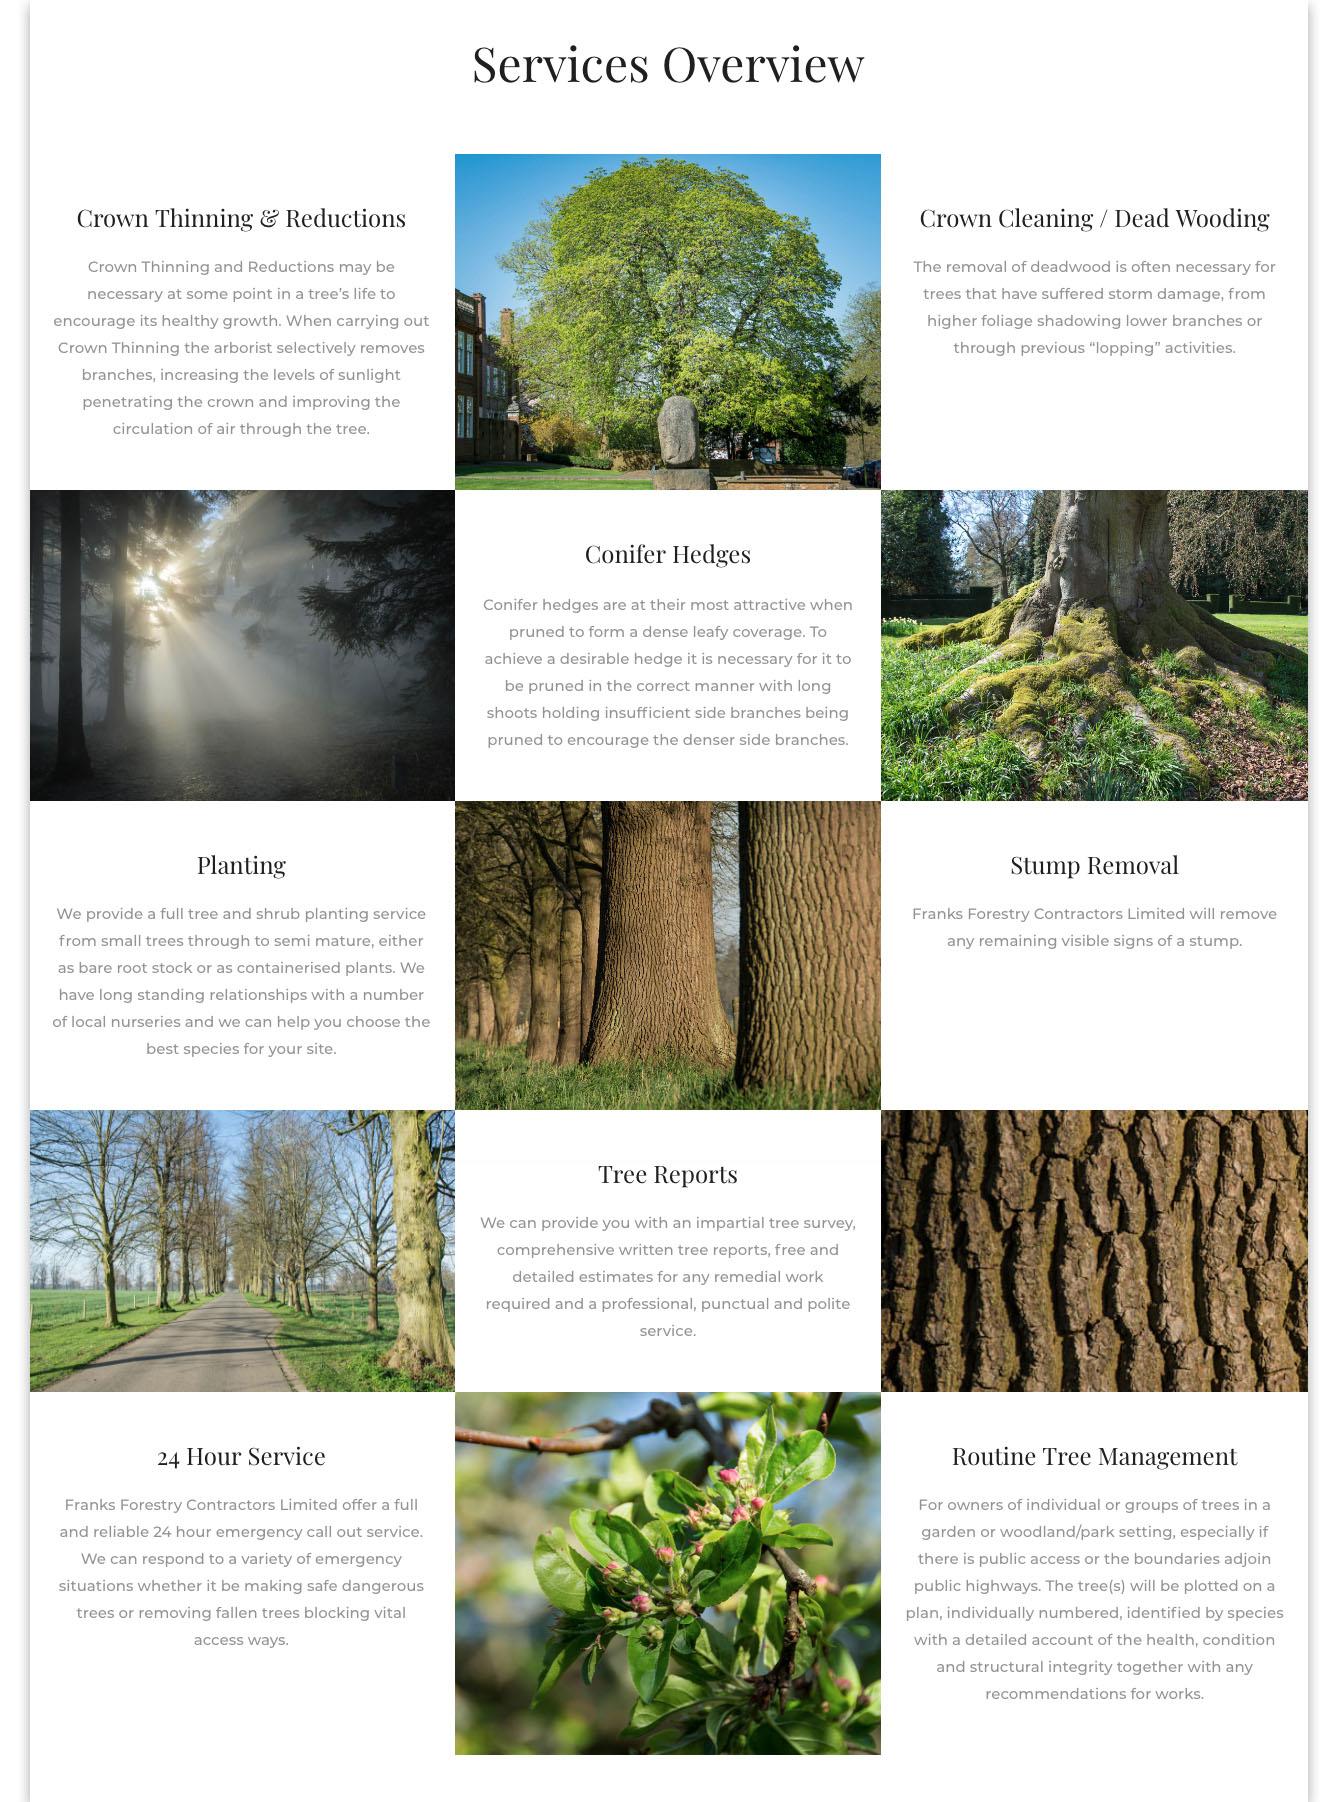 Web designers Belfast portfolio web site - franks forestry home page image 2